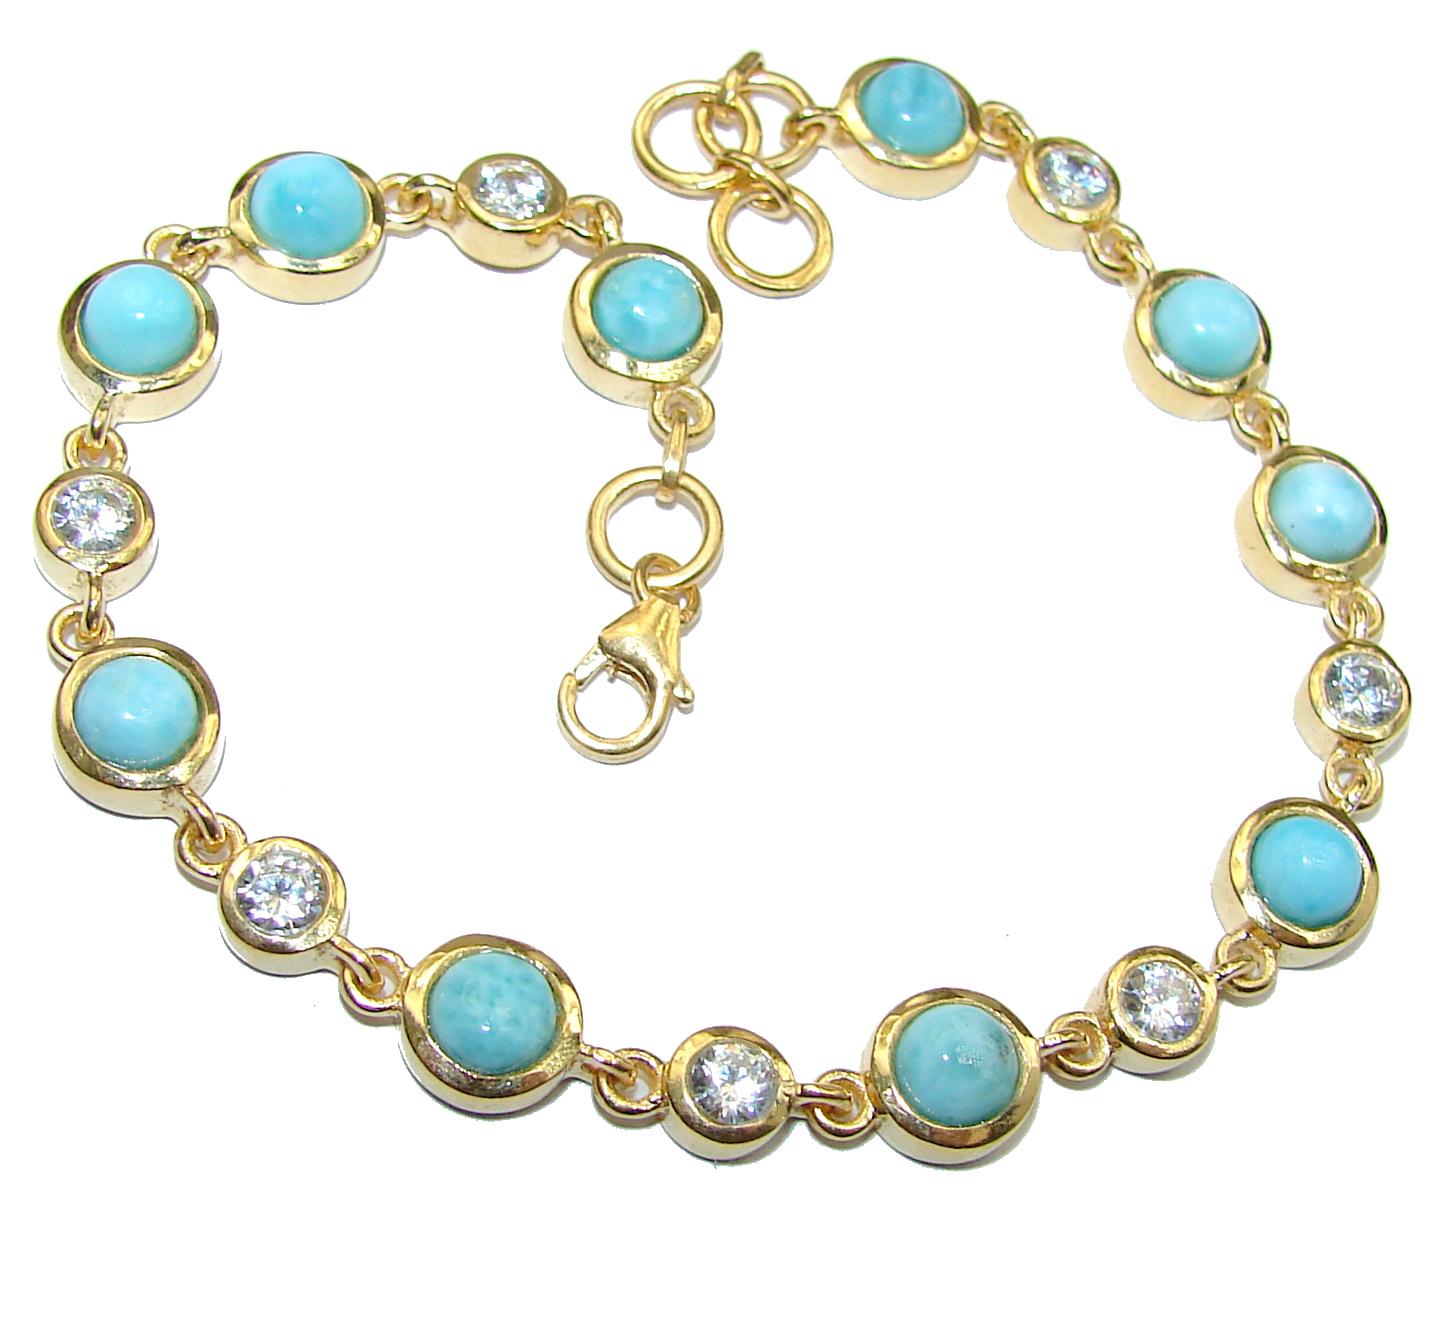 Classy Design authentic Larimar 14k Gold over .925 Sterling Silver handcrafted Bracelet